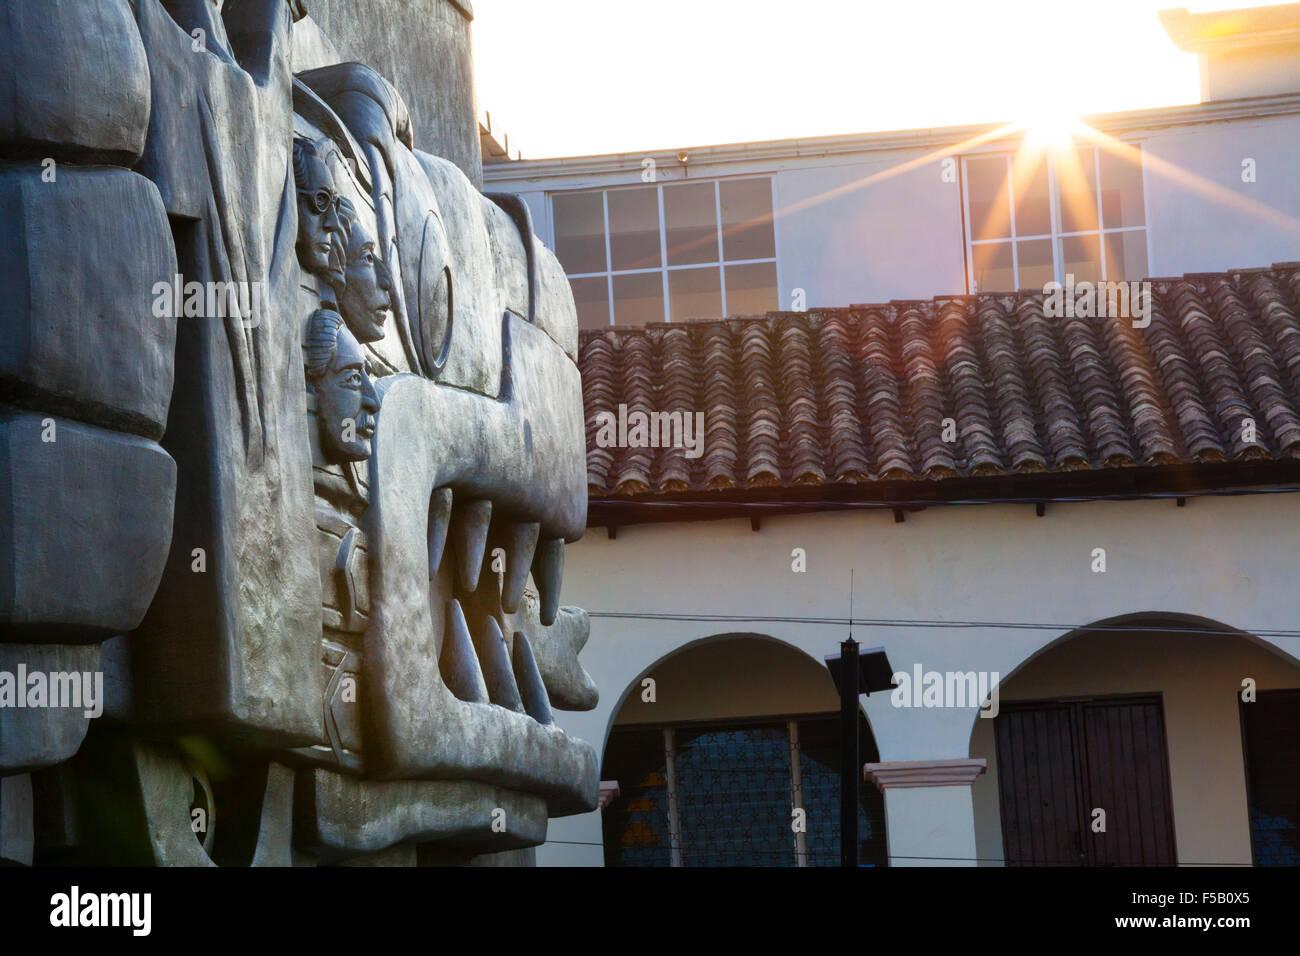 Last rays of sun reflect off the large Totonac relief near the plaza of Papantla, Veracruz, Mexico. - Stock Image